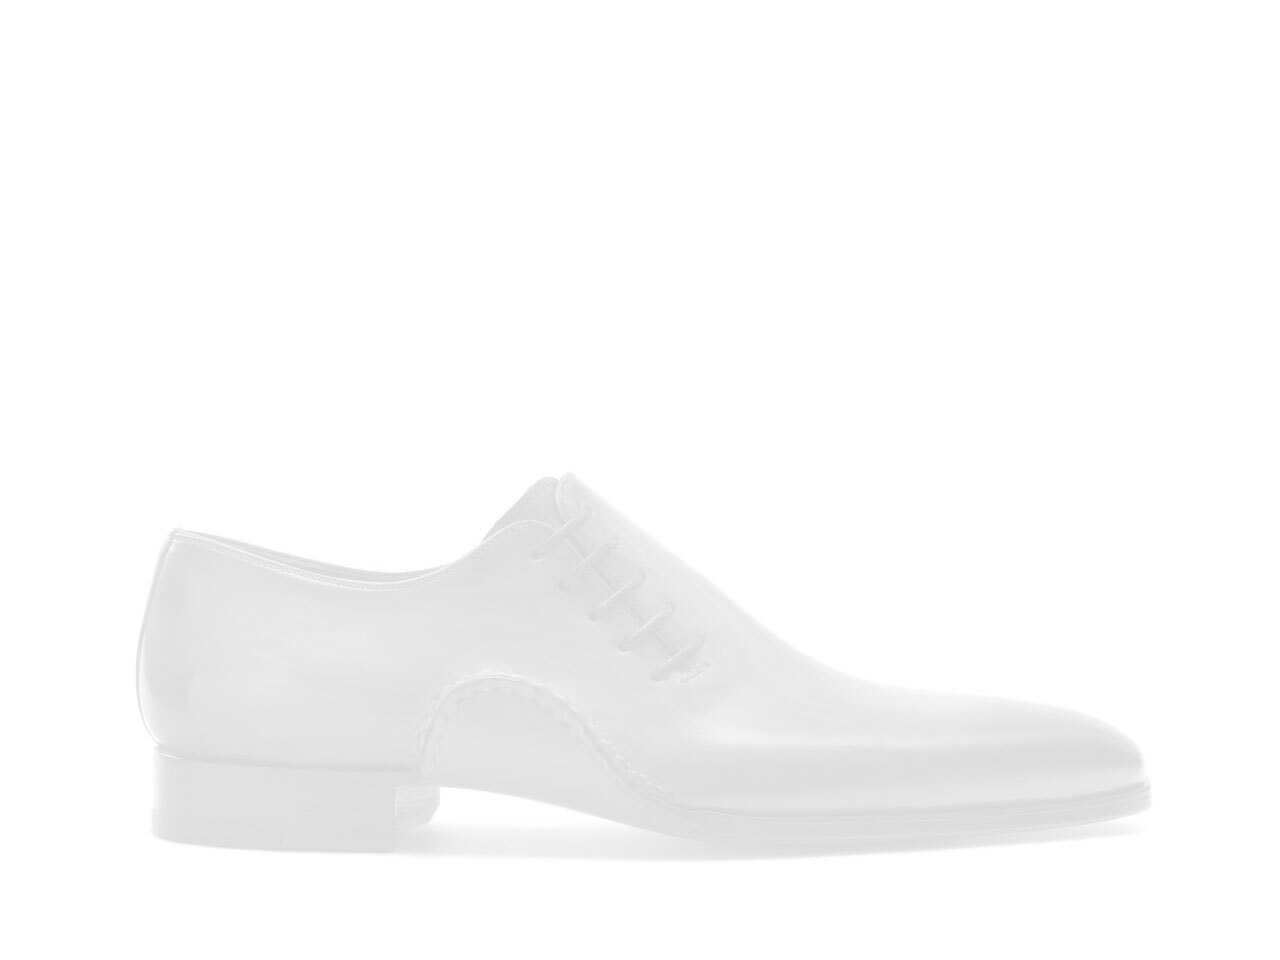 Cuero brown alligator leather shoes for men - Magnanni